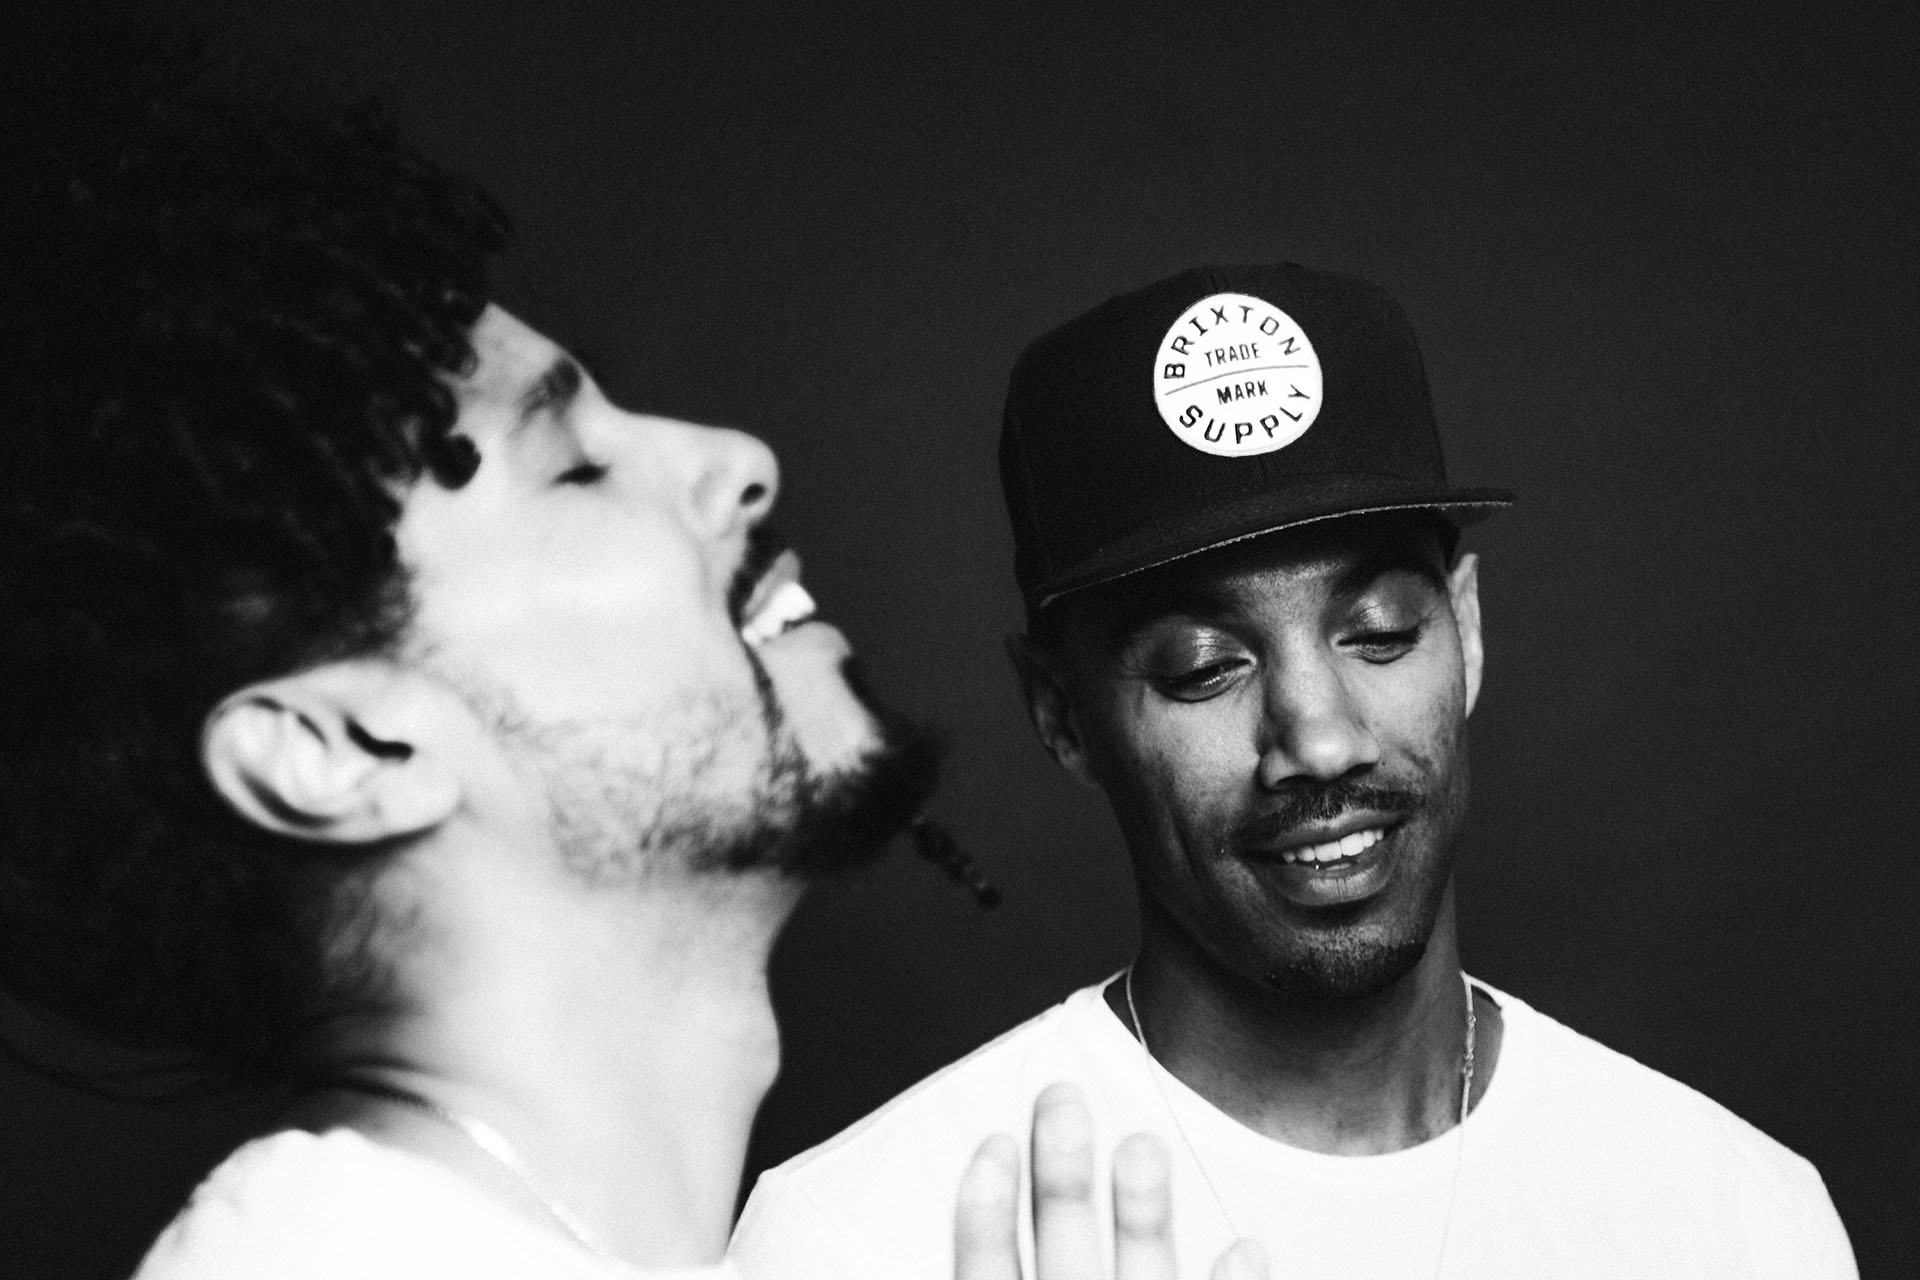 Black Saint drop club-ready new single 'Bae Bae Bae'